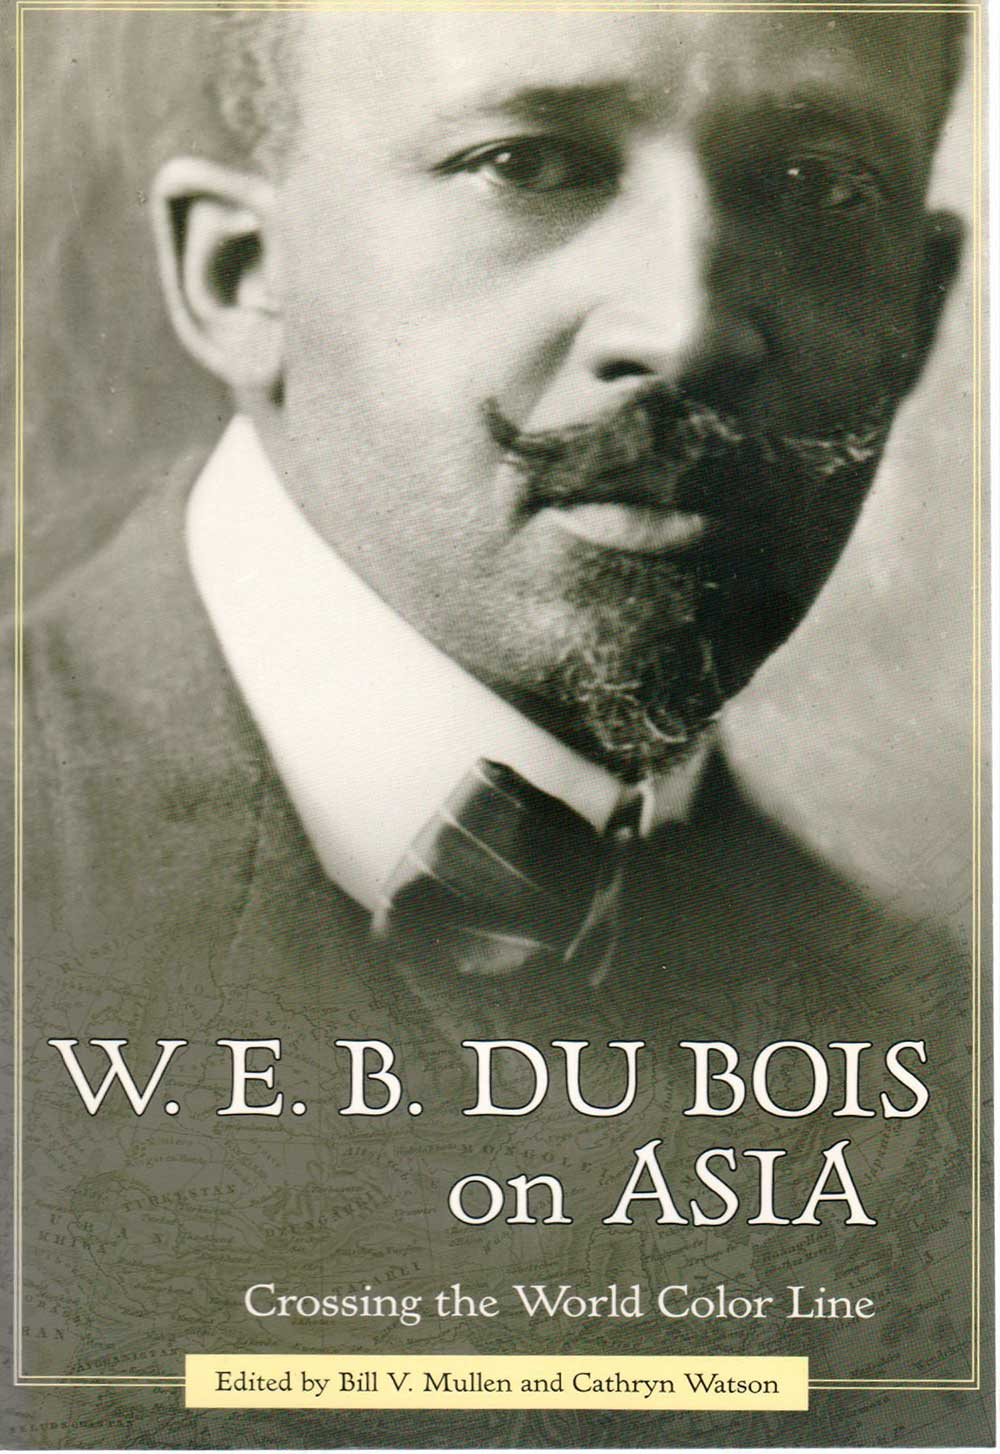 mullen-book-cover10-dubois-asia-1000px (1).jpg